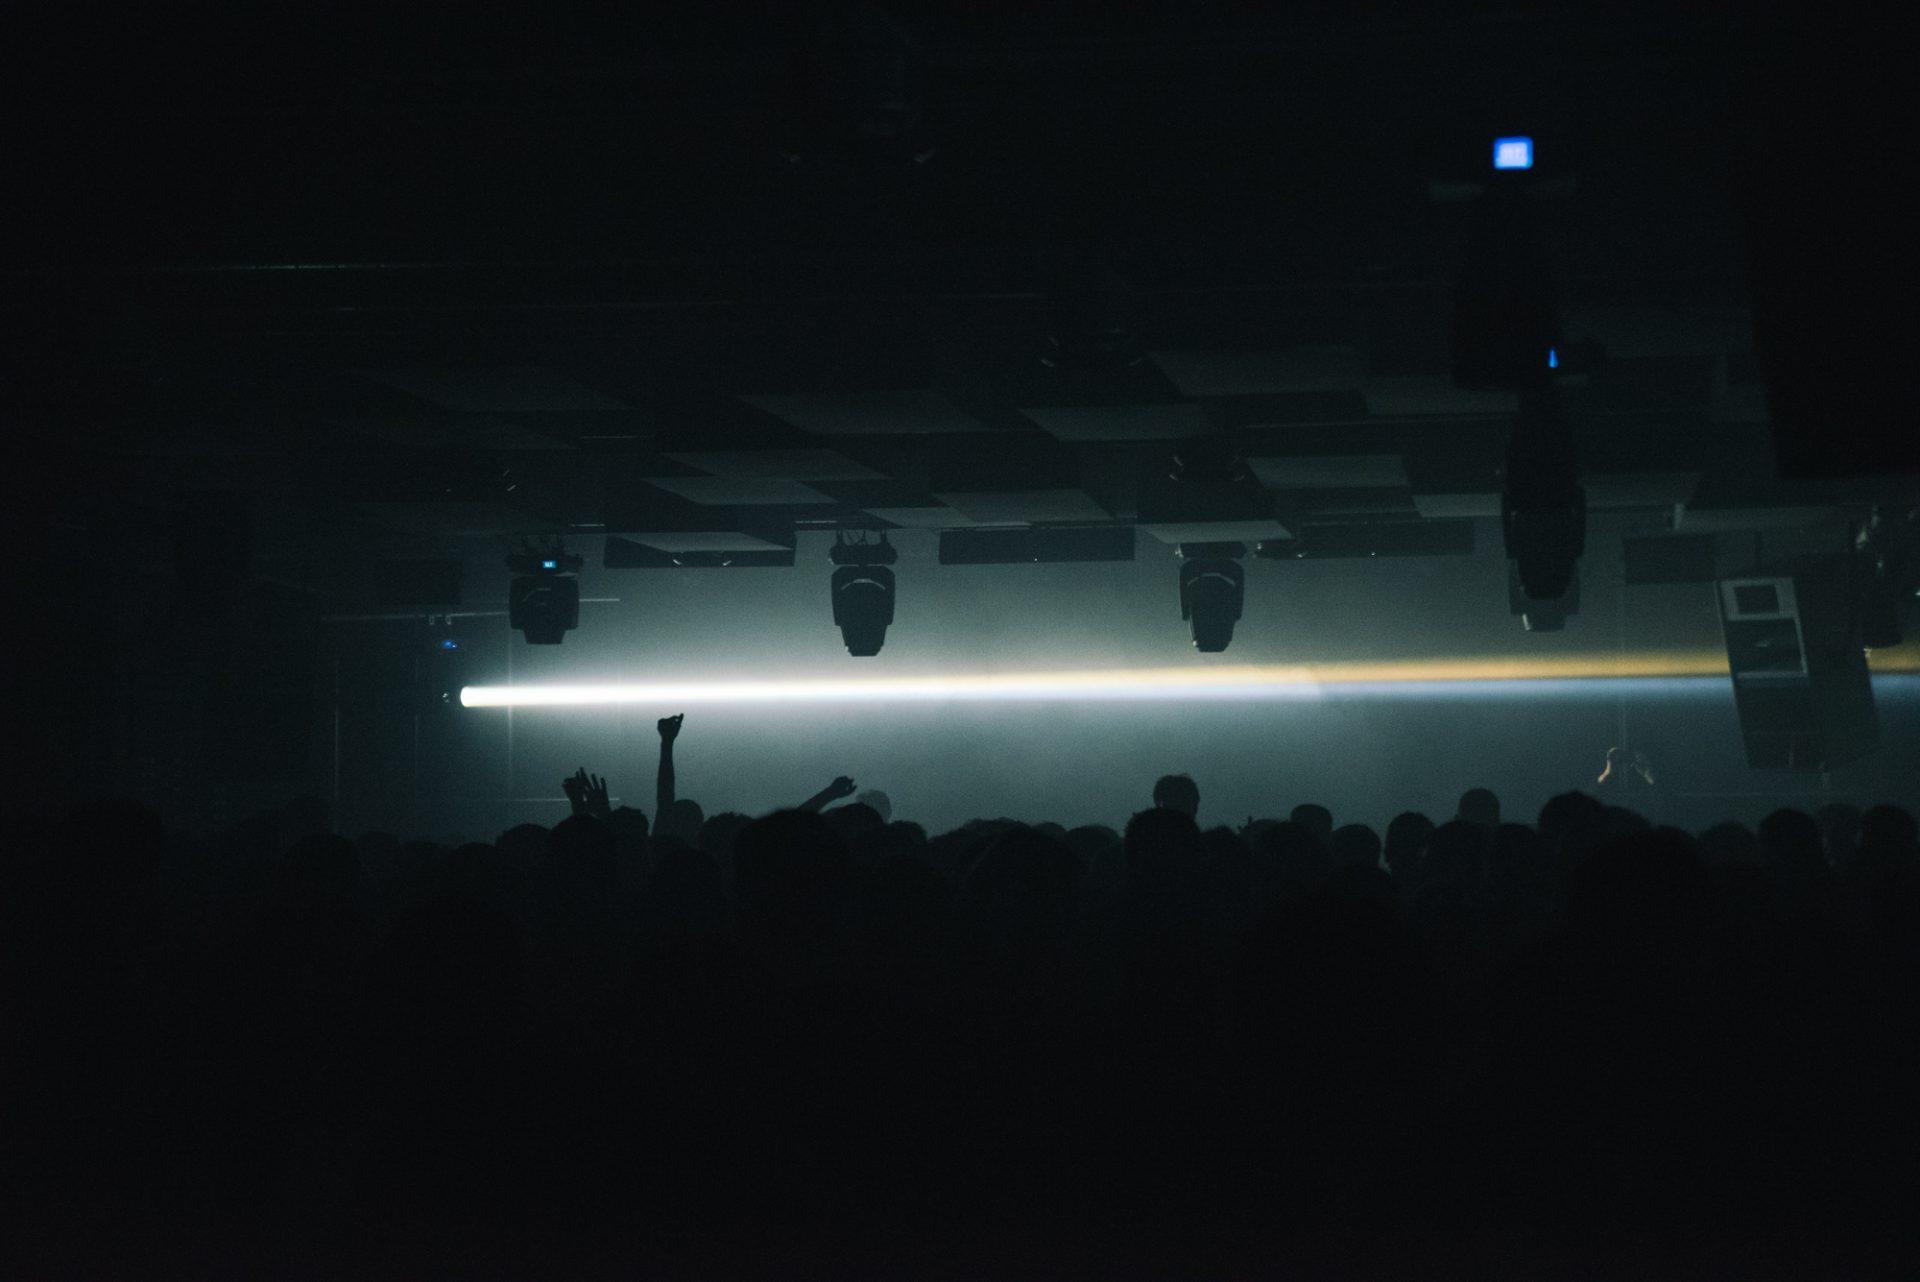 FOLD nightclub canning town